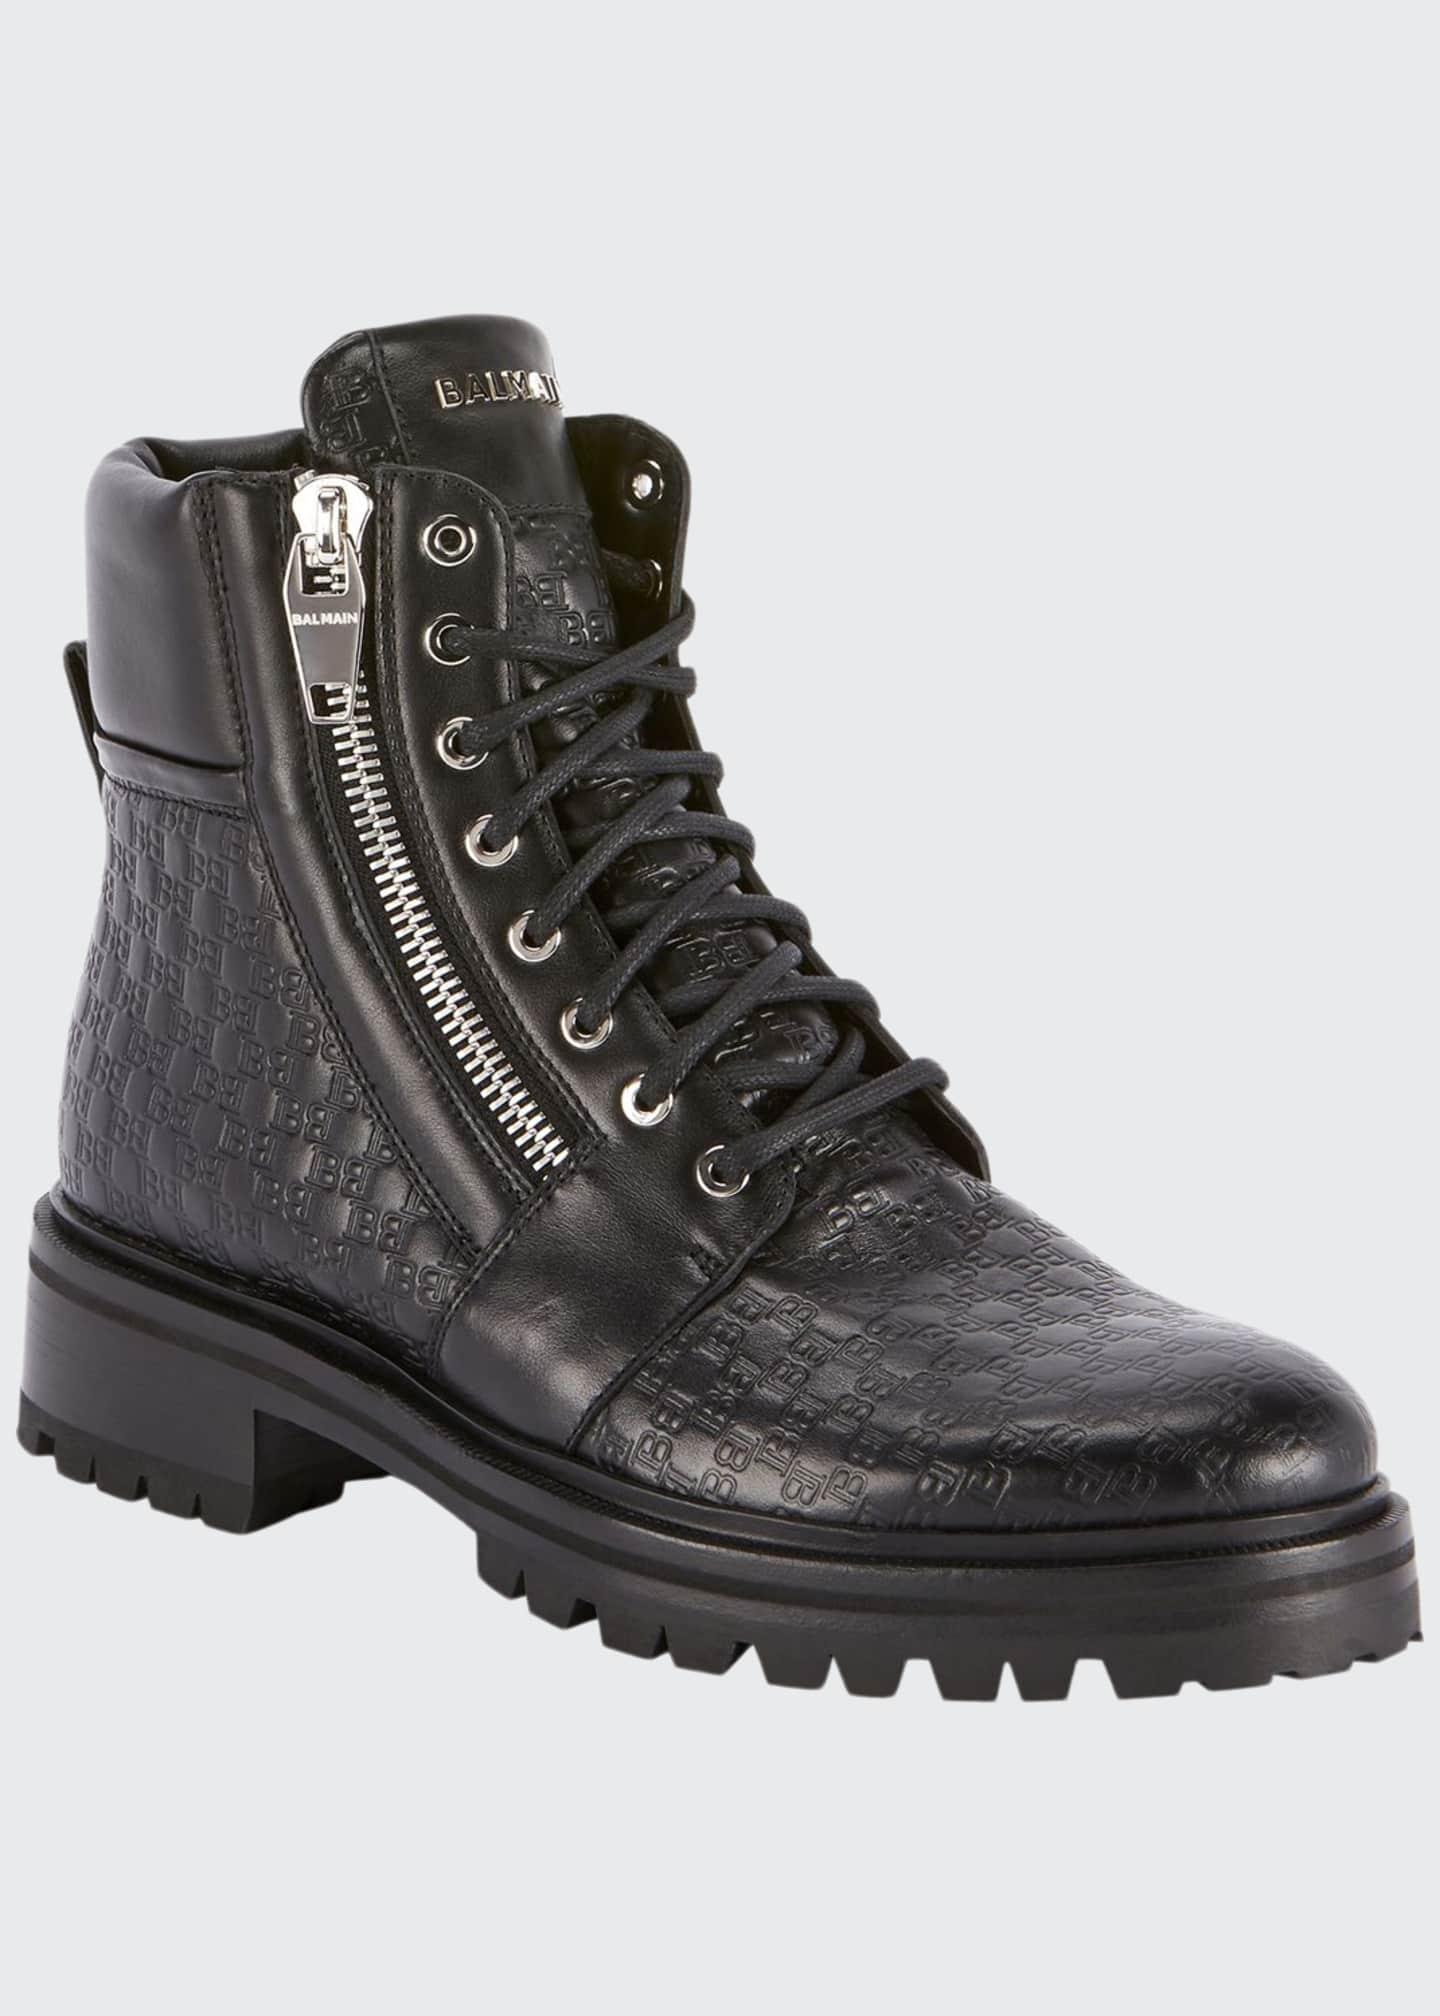 Balmain Men's Monogrammed Leather Combat Boots